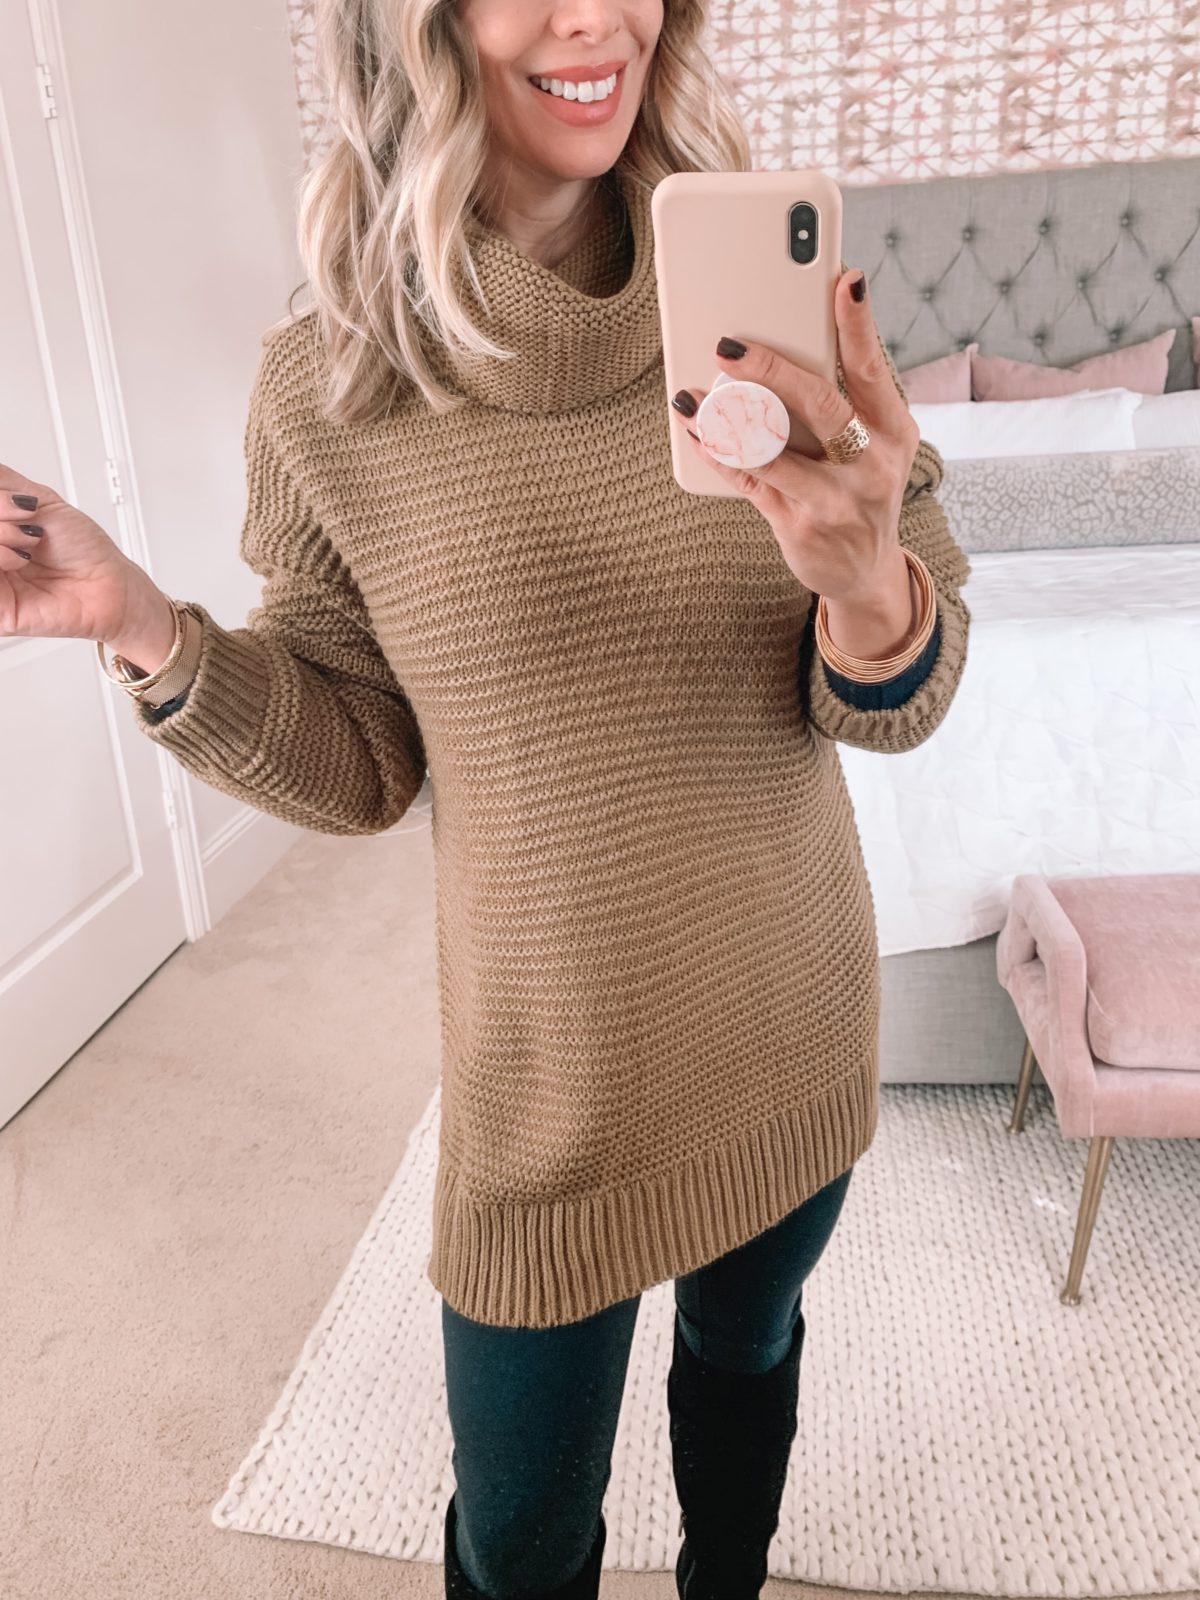 Amazon Fashion Faves, Turtleneck Sweater, Ponte Leggings, Knee High Boots